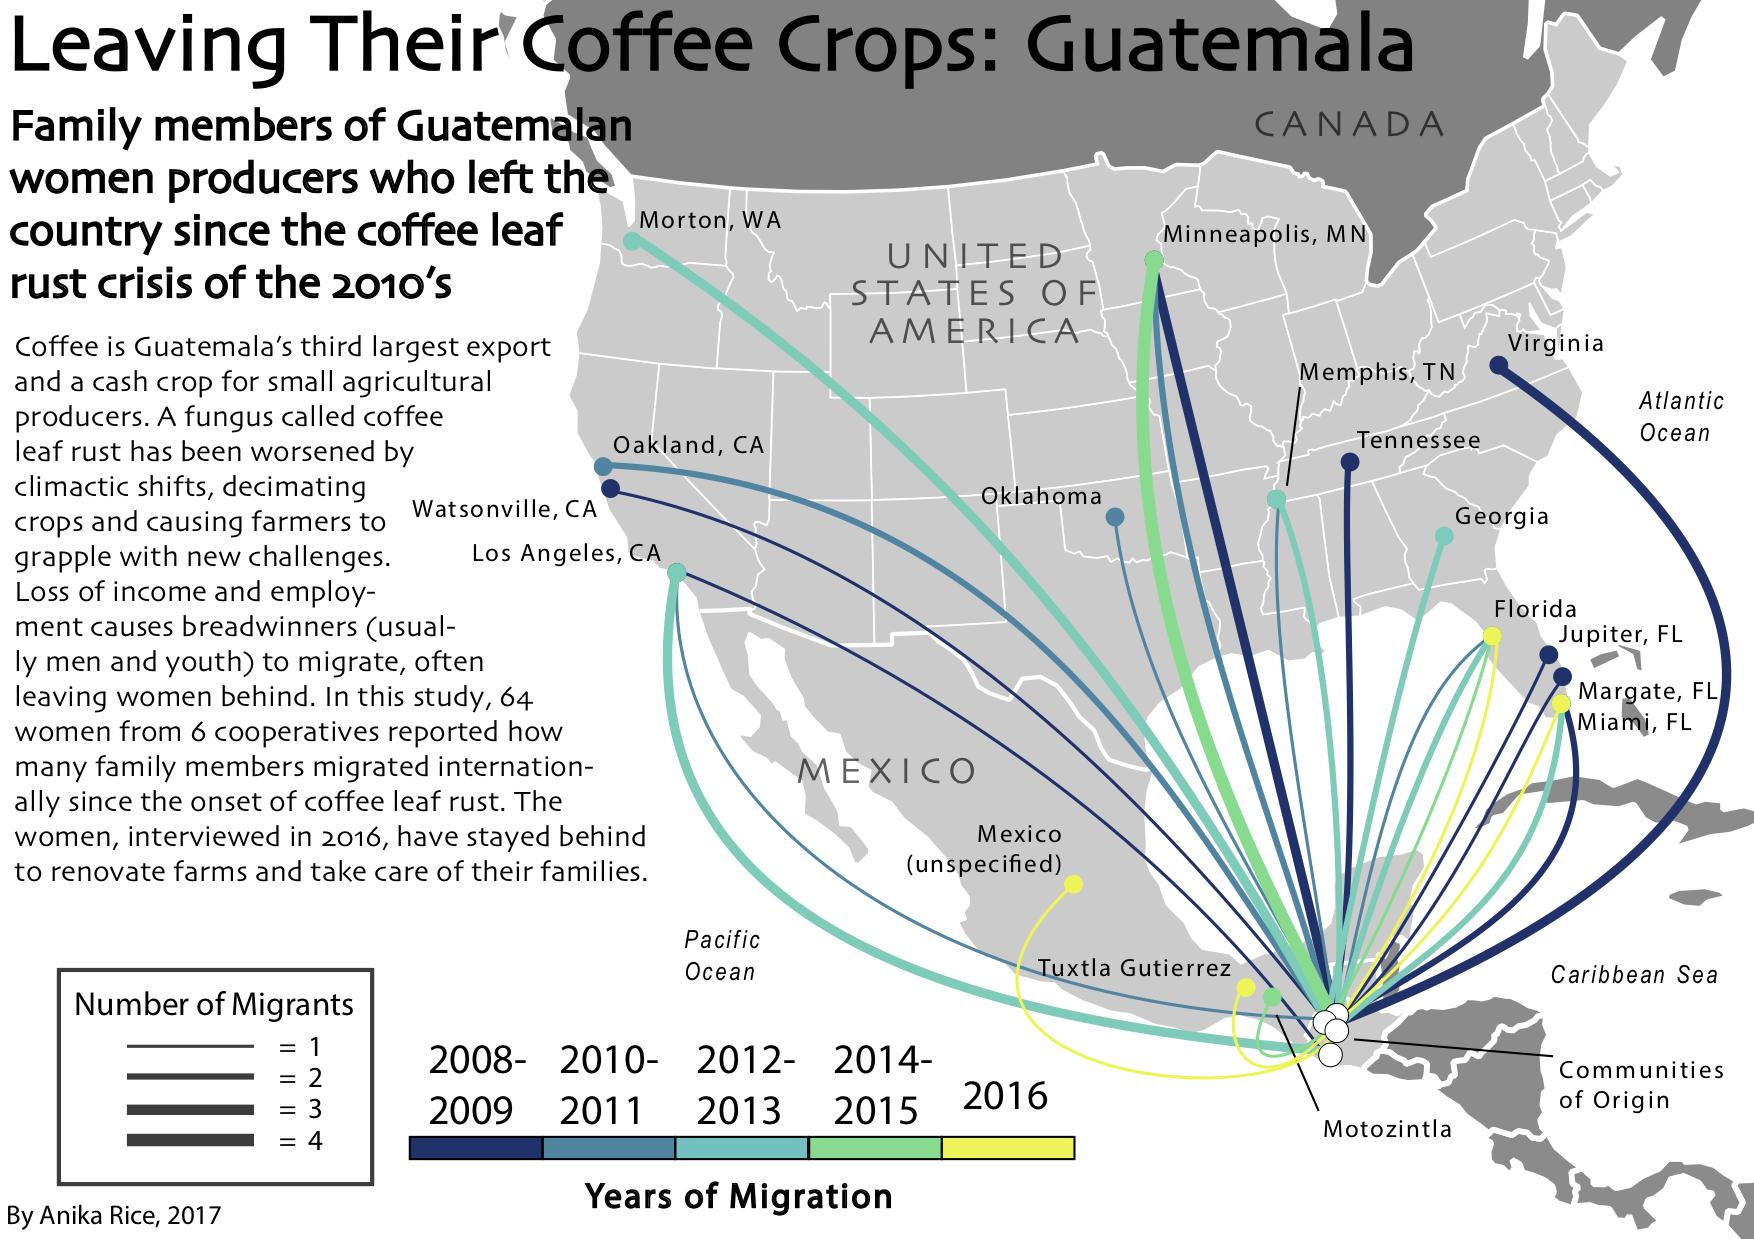 Guatemala Migrations Map.jpg